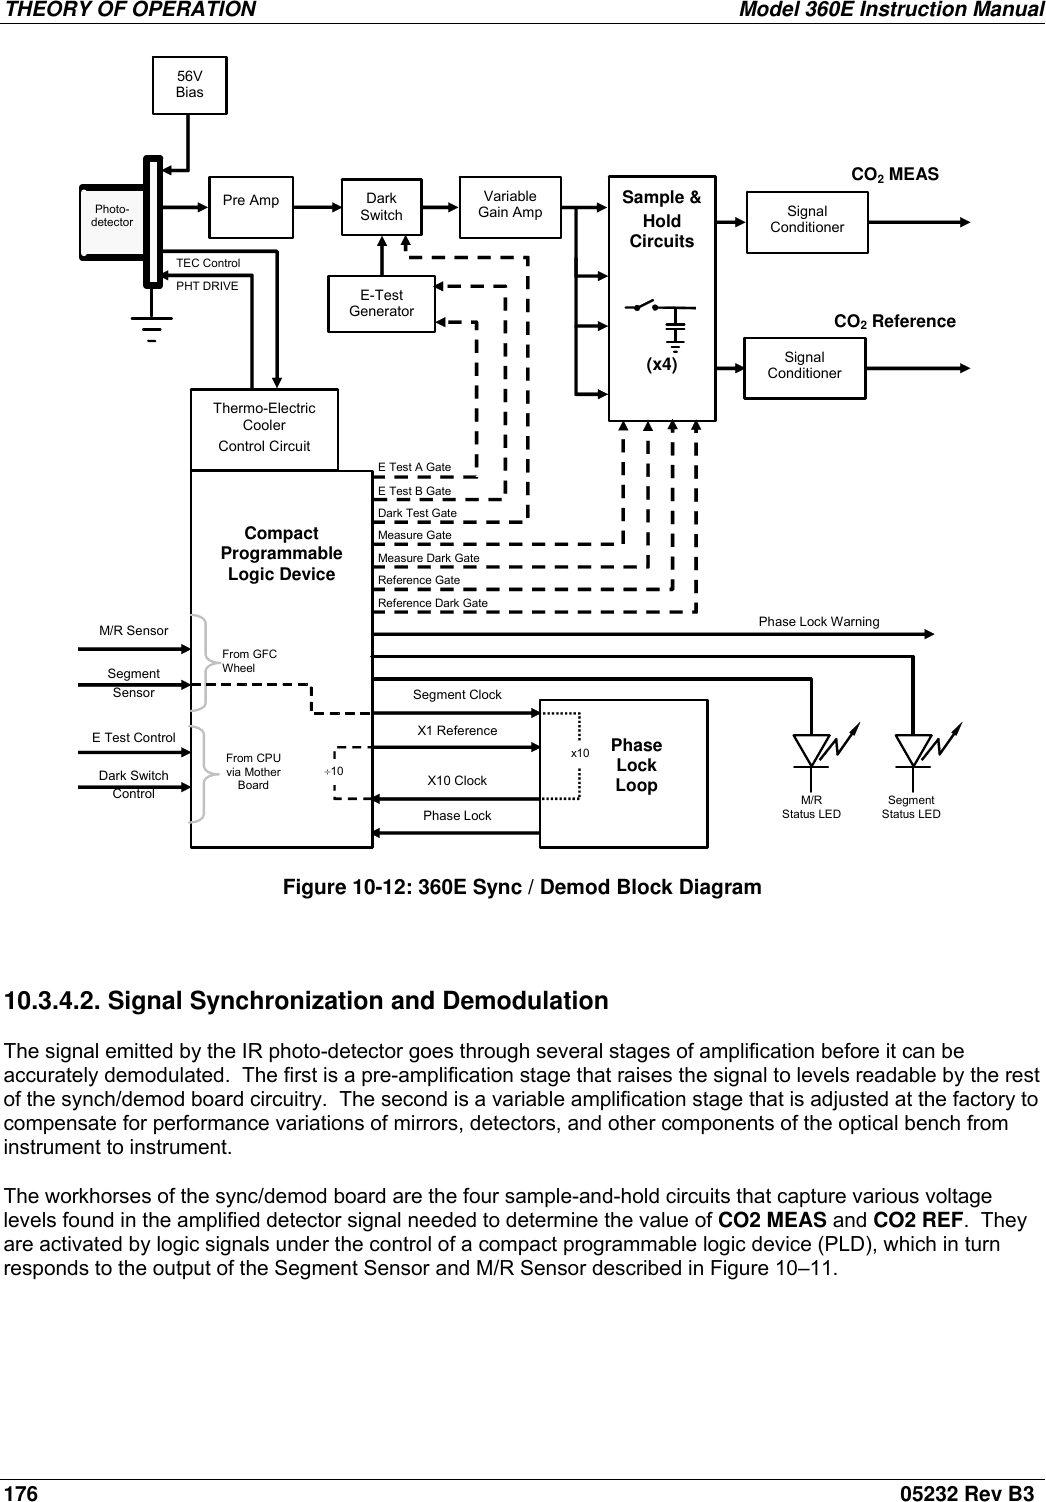 Teledyne 360E Users Manual INSTRUCTION CARBON DIOXIDE ANALYZER